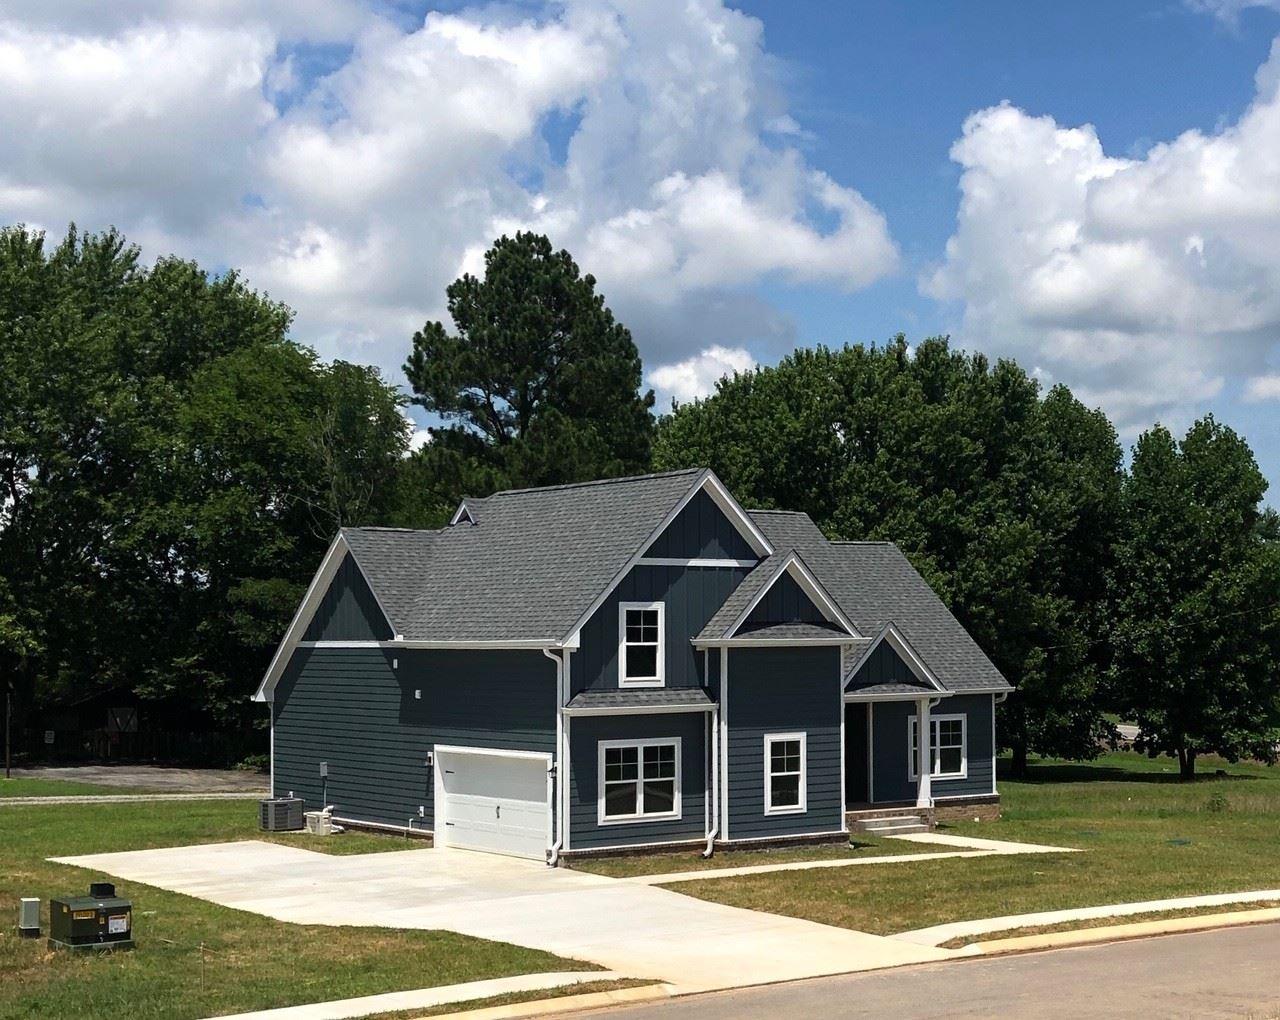 1039 Melvin Drive, Cross Plains, TN 37049 - MLS#: 2164866